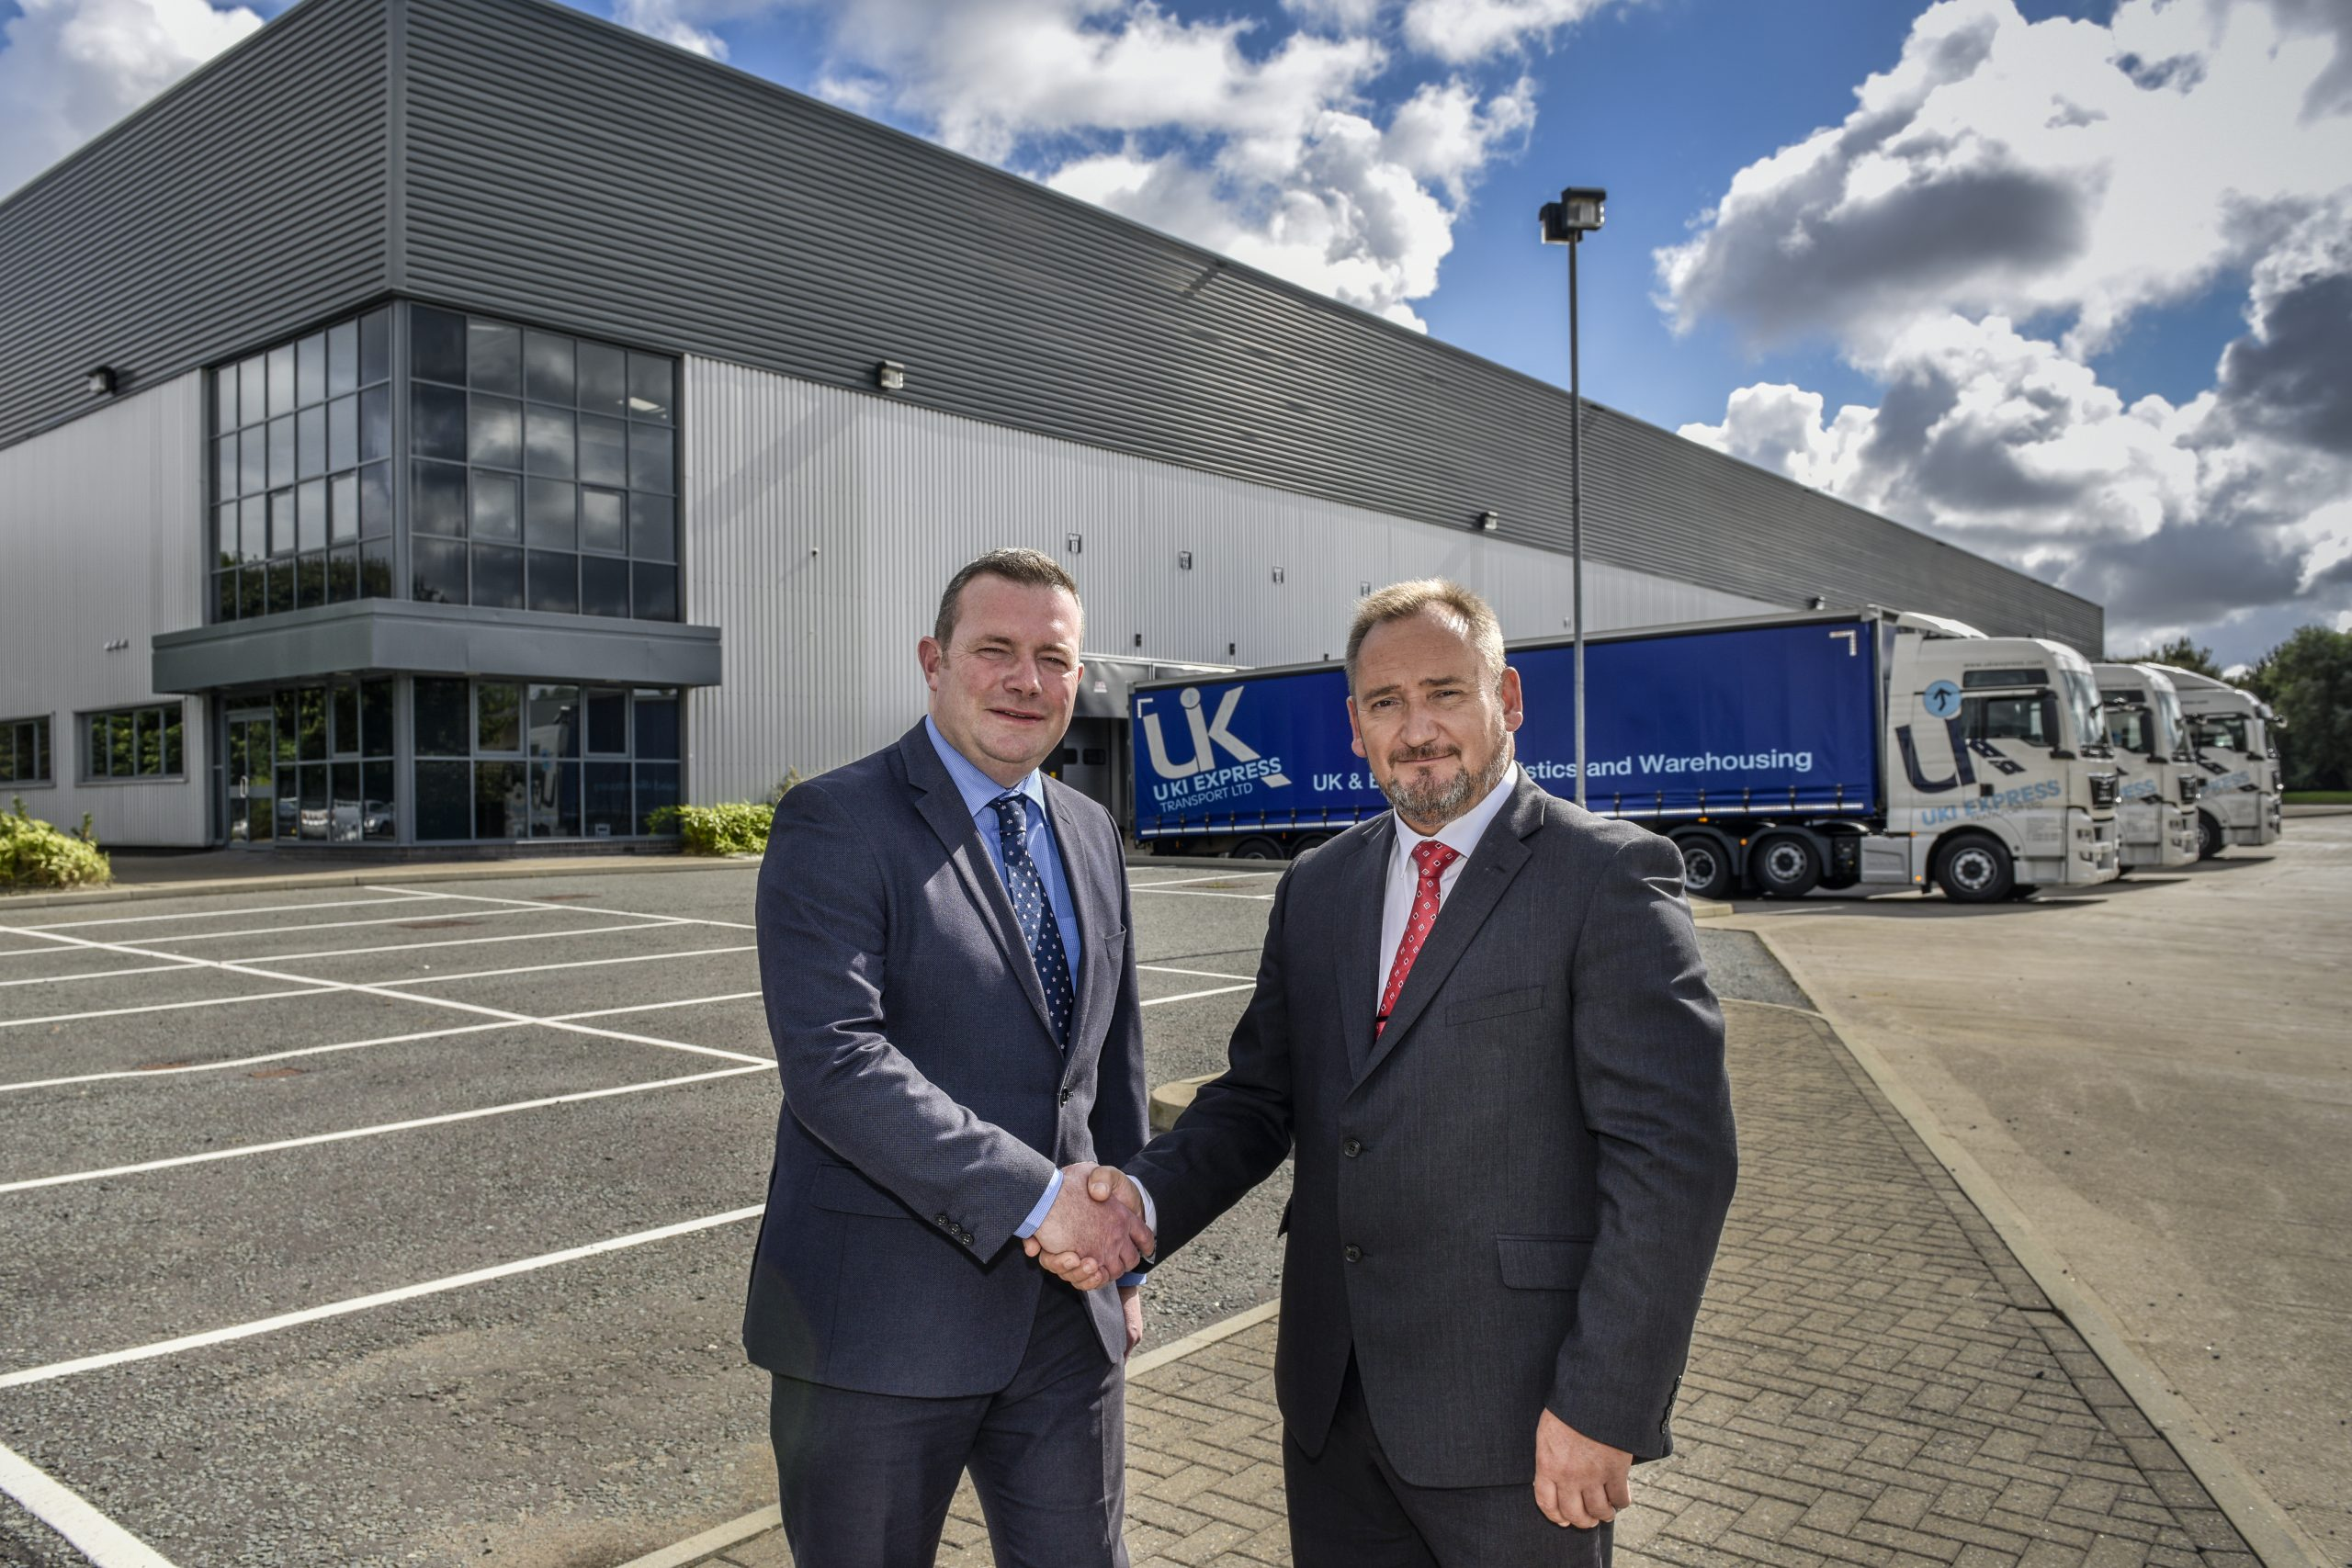 Peter Gummerson, Managing Director of UKI Express Transport Ltd and Dennis Dwyer, Orbit Developments' Divisional Director for Merseyside